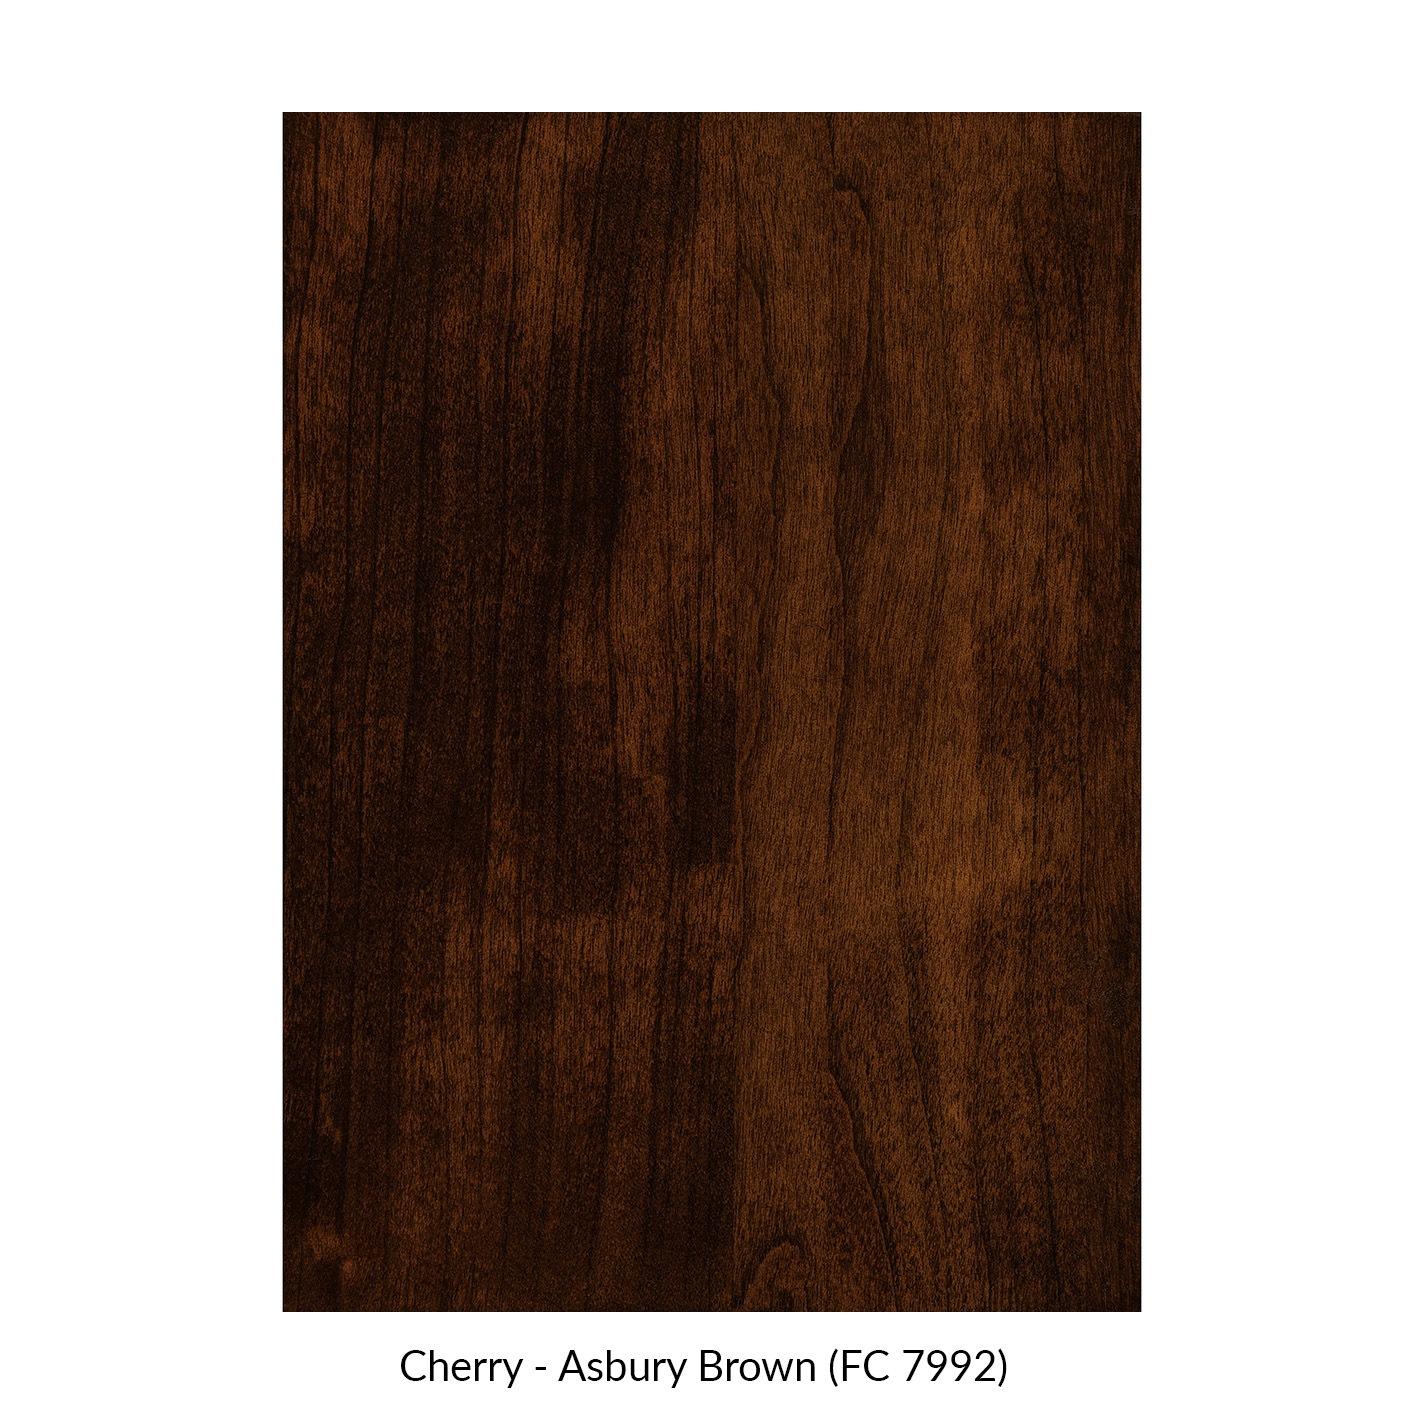 spectrum-cherry-asbury-brown-fc-7992.jpg